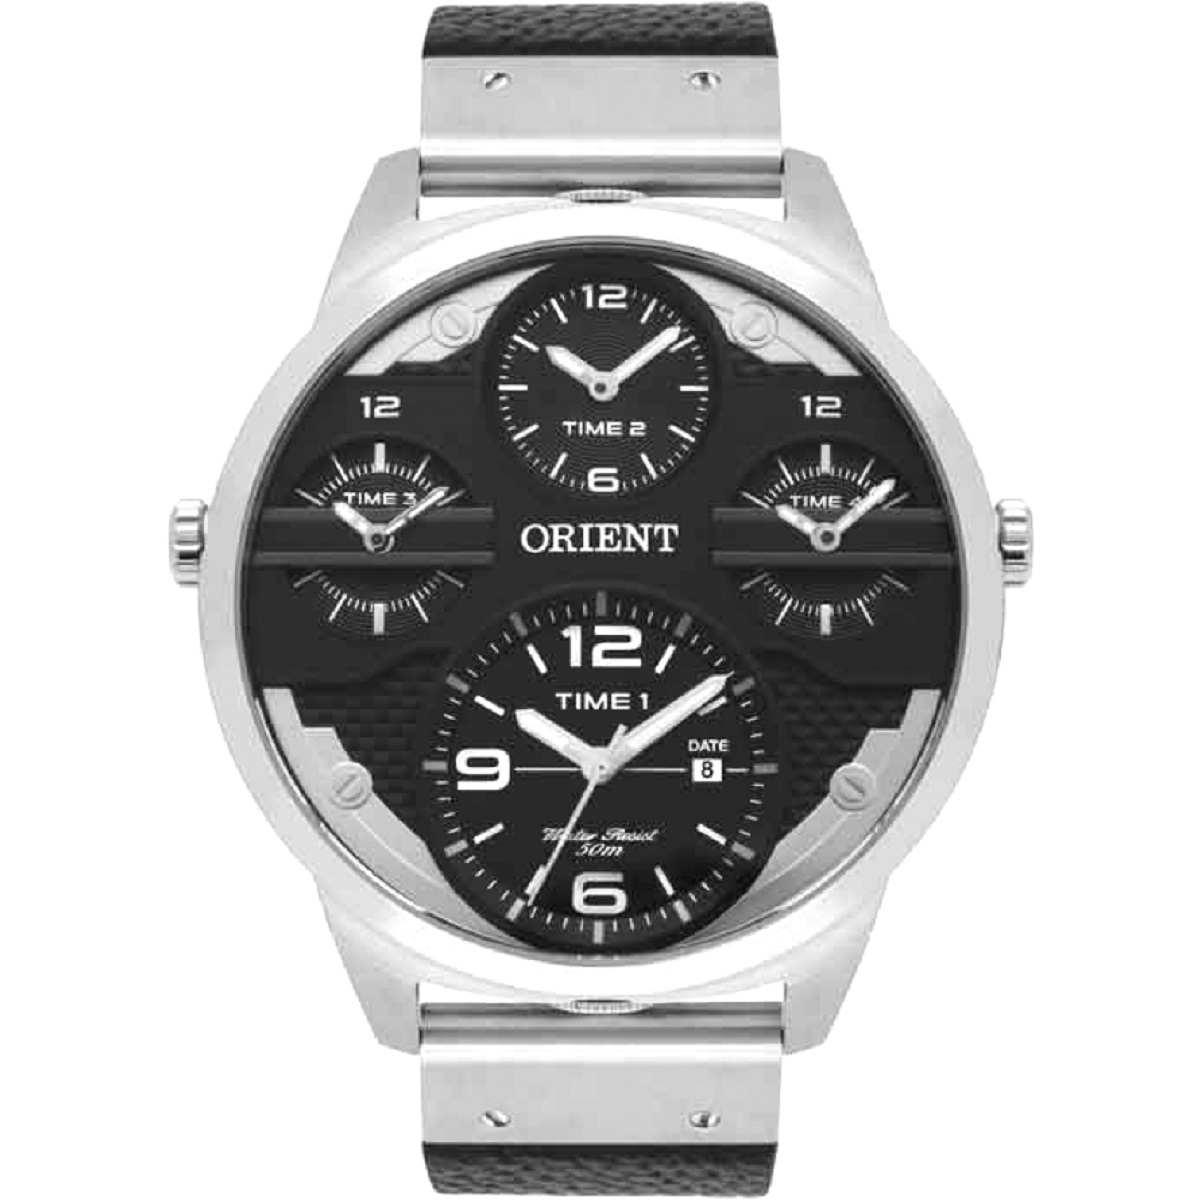 Relógio Orient Masculino Cronógrafo Prateado Pulseira De Couro Preto MBSCT003 P2PX